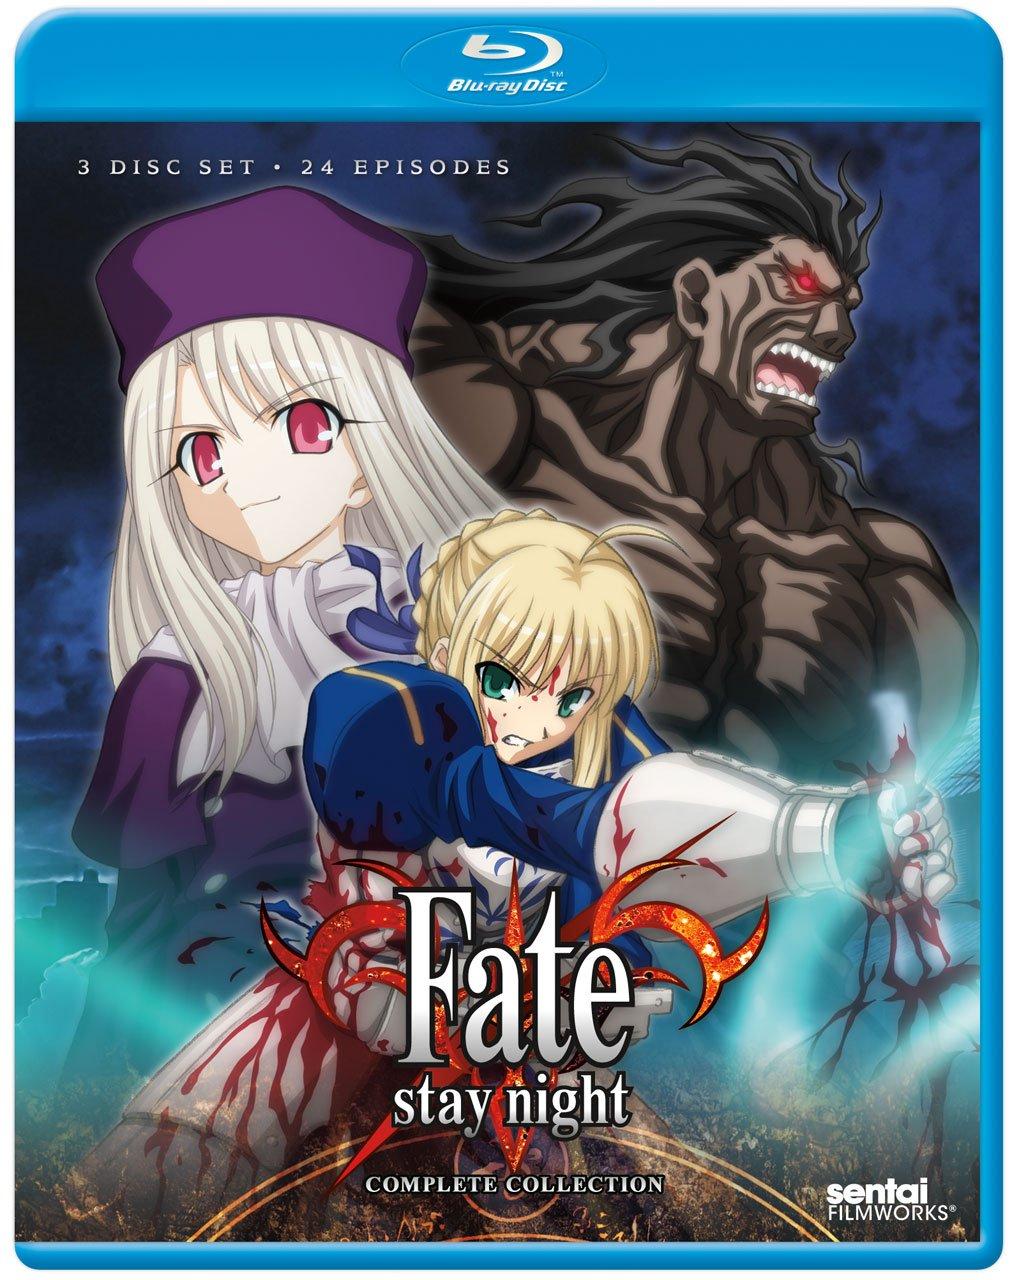 hercules, heracles, berserker, saber, arturia pendragon, Illyasviel von Einzbern, anime, fate / stay night